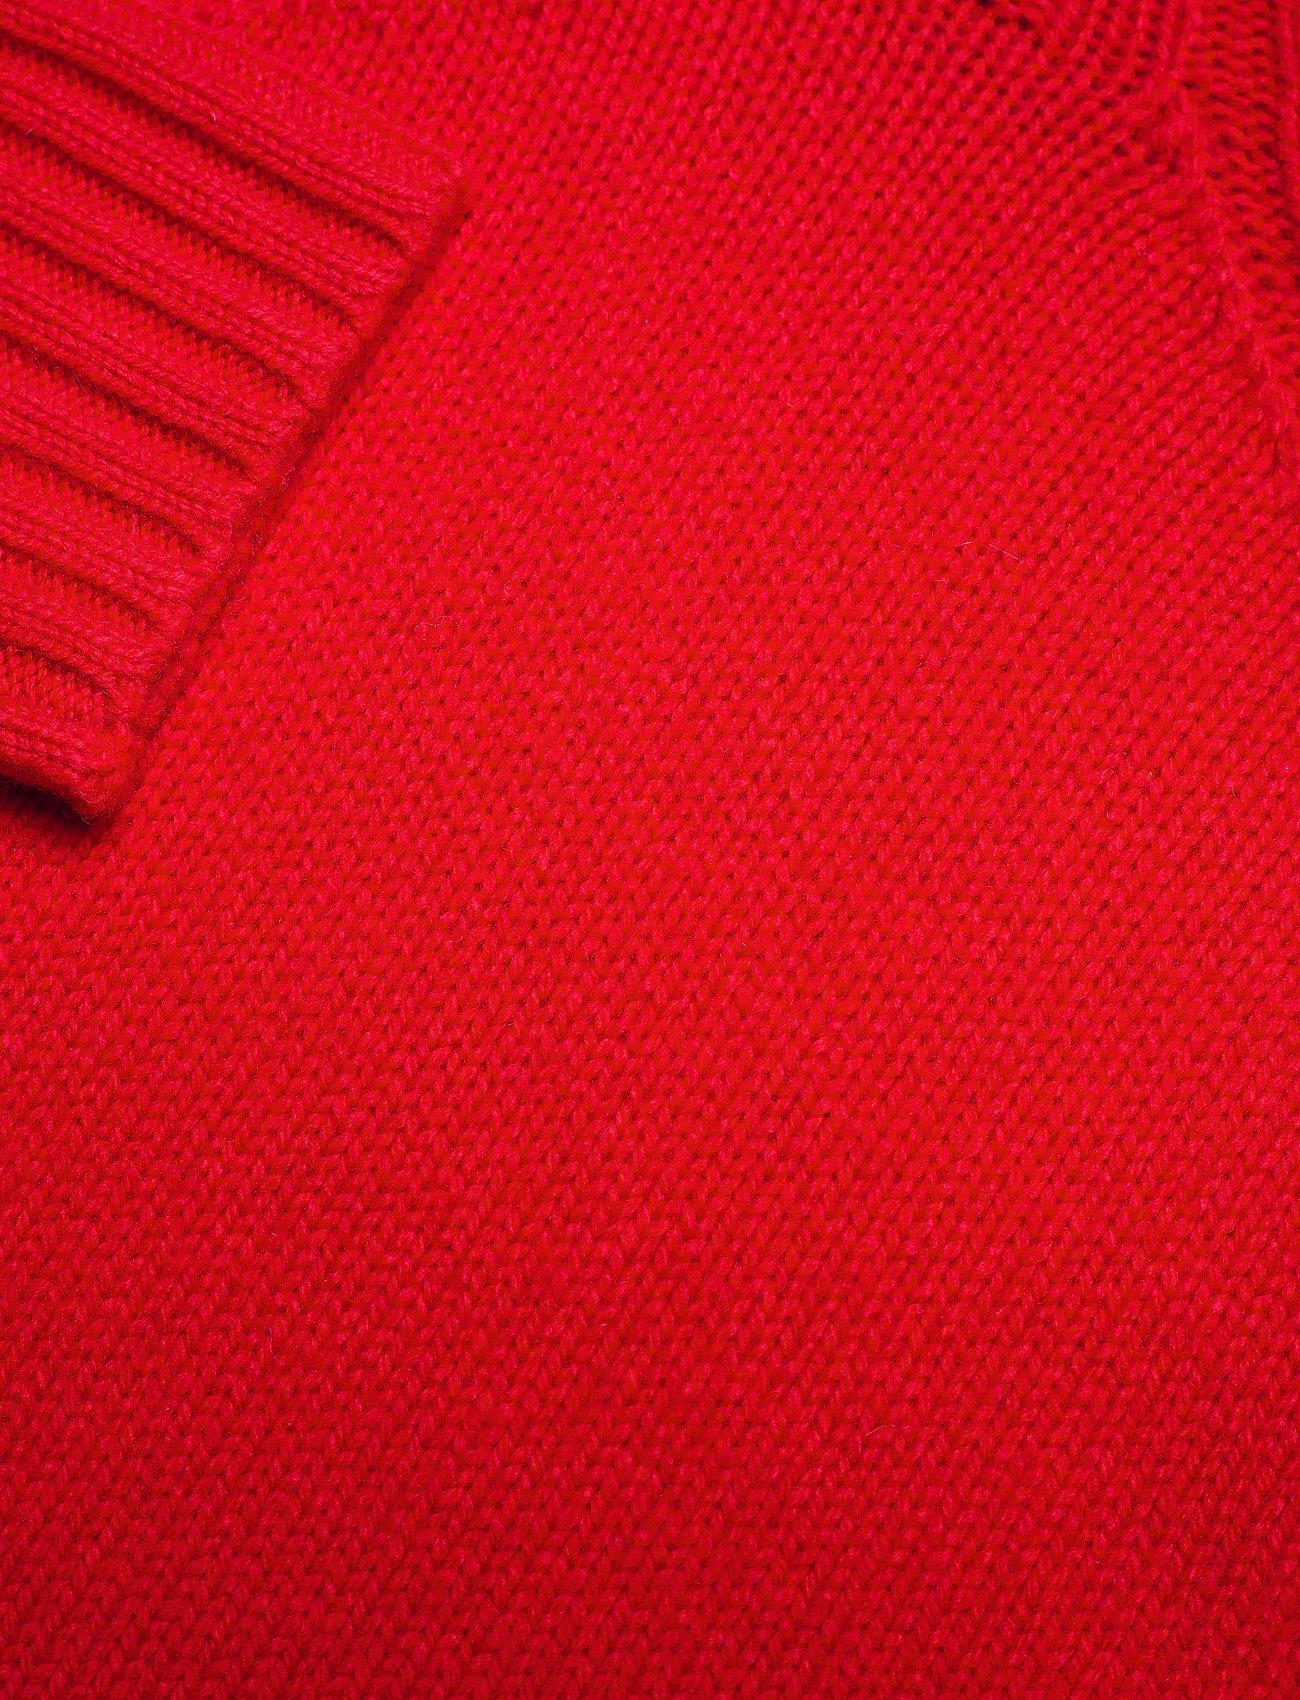 Wool/cashmere Jsy-lsl-swt (Fall Red) (1016.95 kr) - Polo Ralph Lauren